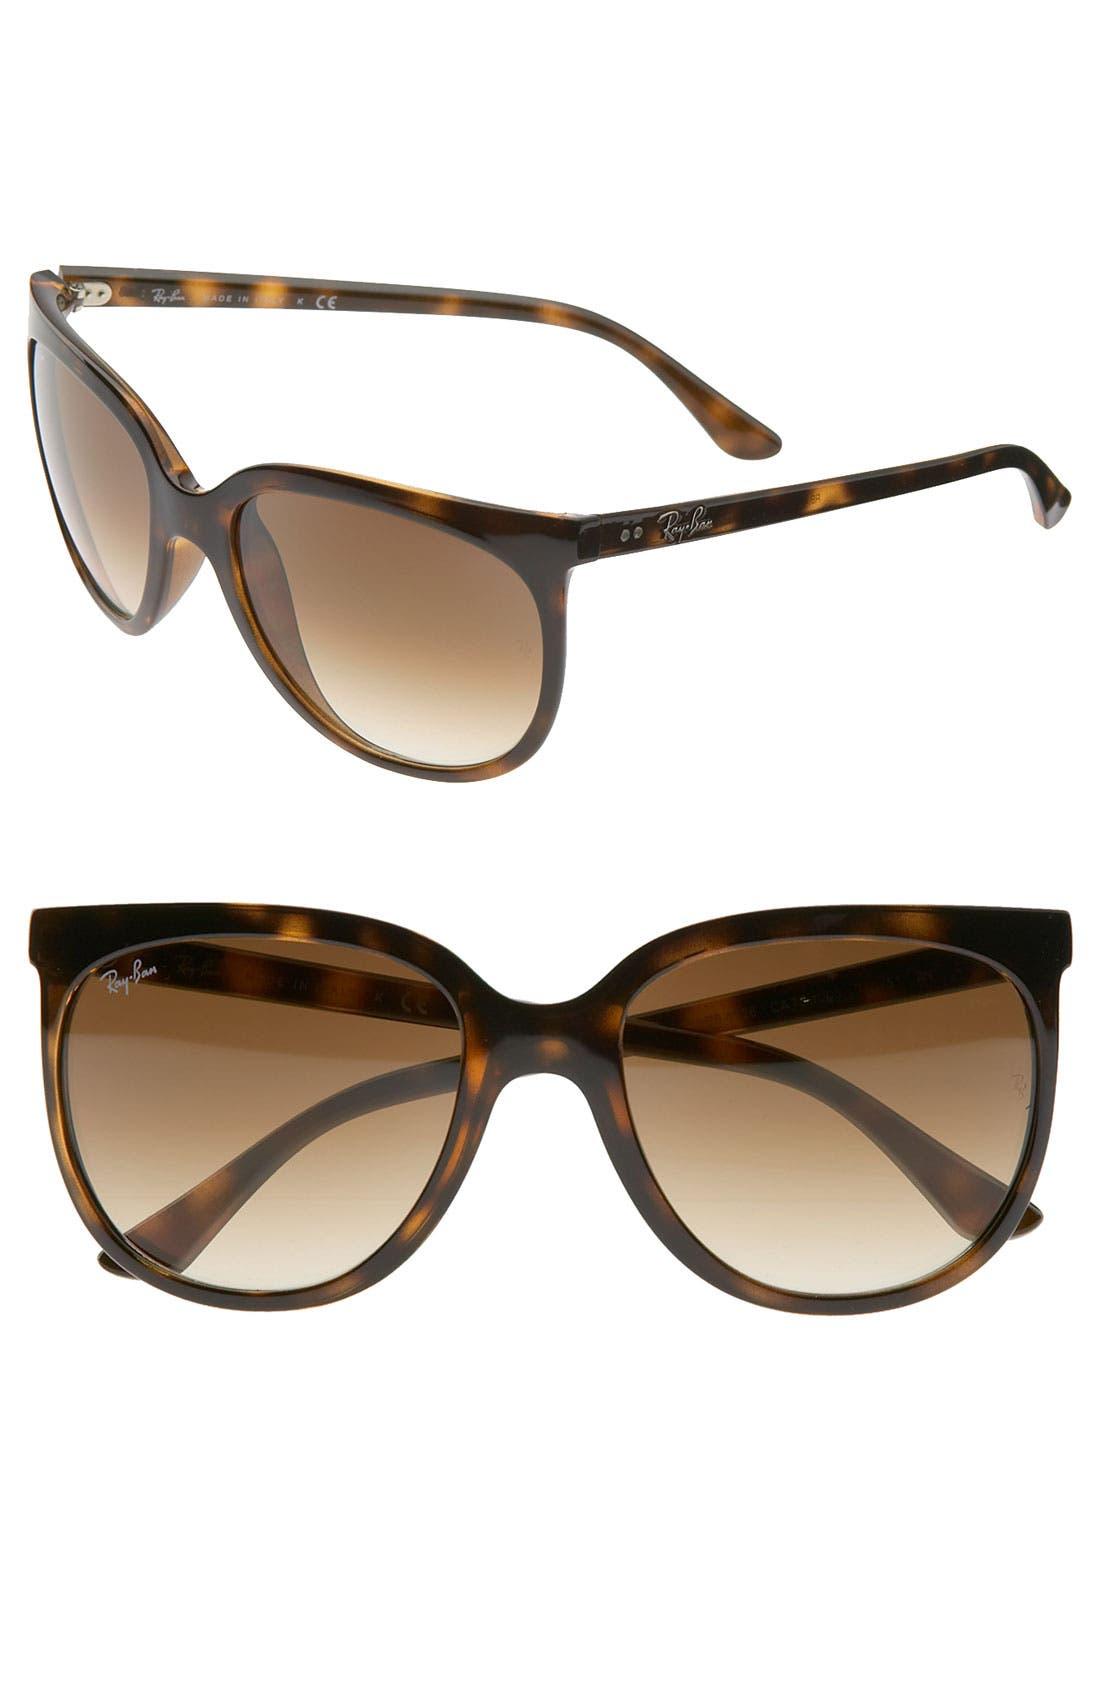 Retro Cat Eye Sunglasses,                             Main thumbnail 1, color,                             Havana